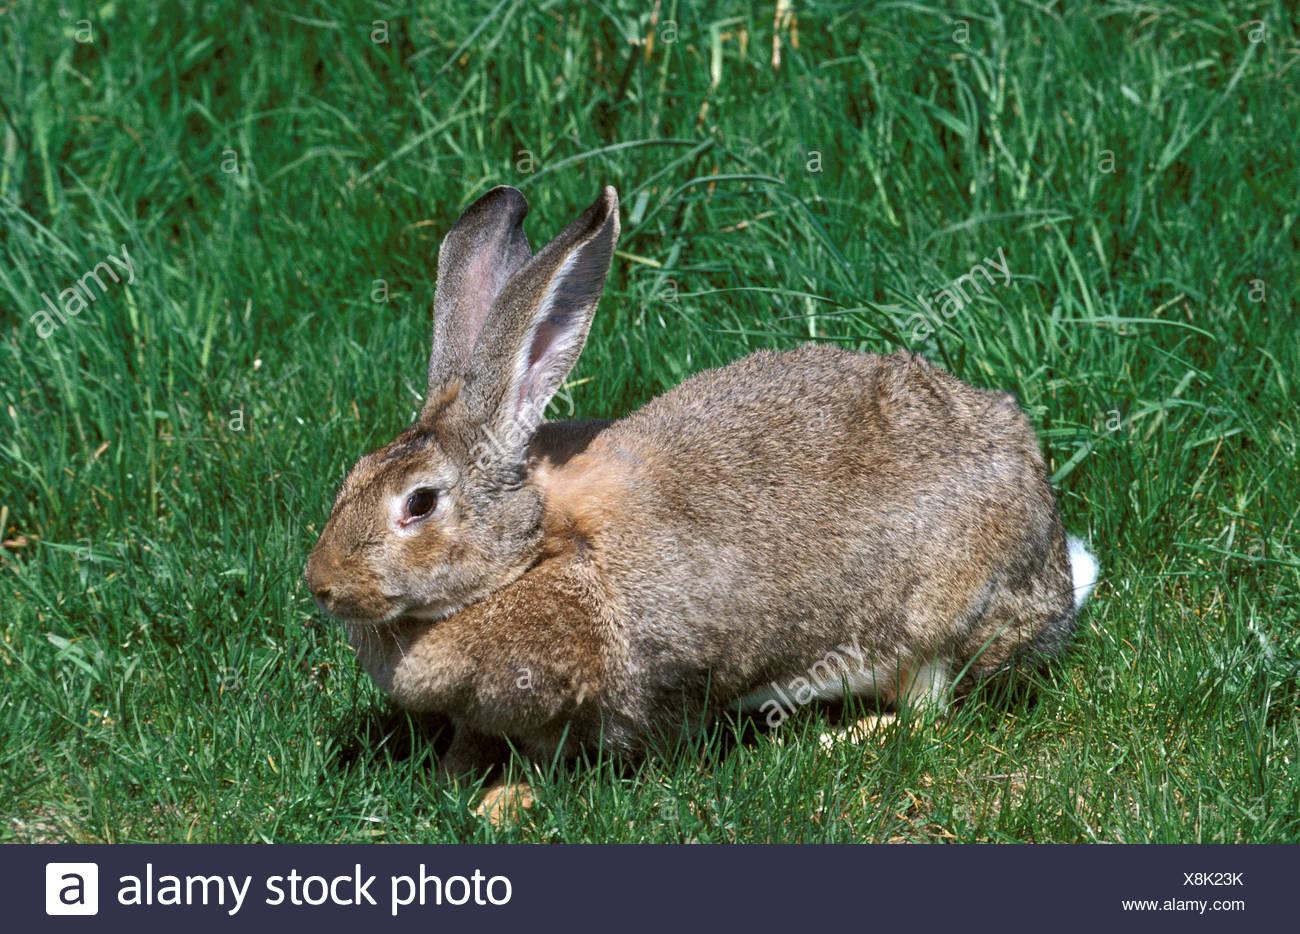 Flemish Giant Rabbit Breed From Flanders In Belgium Stock